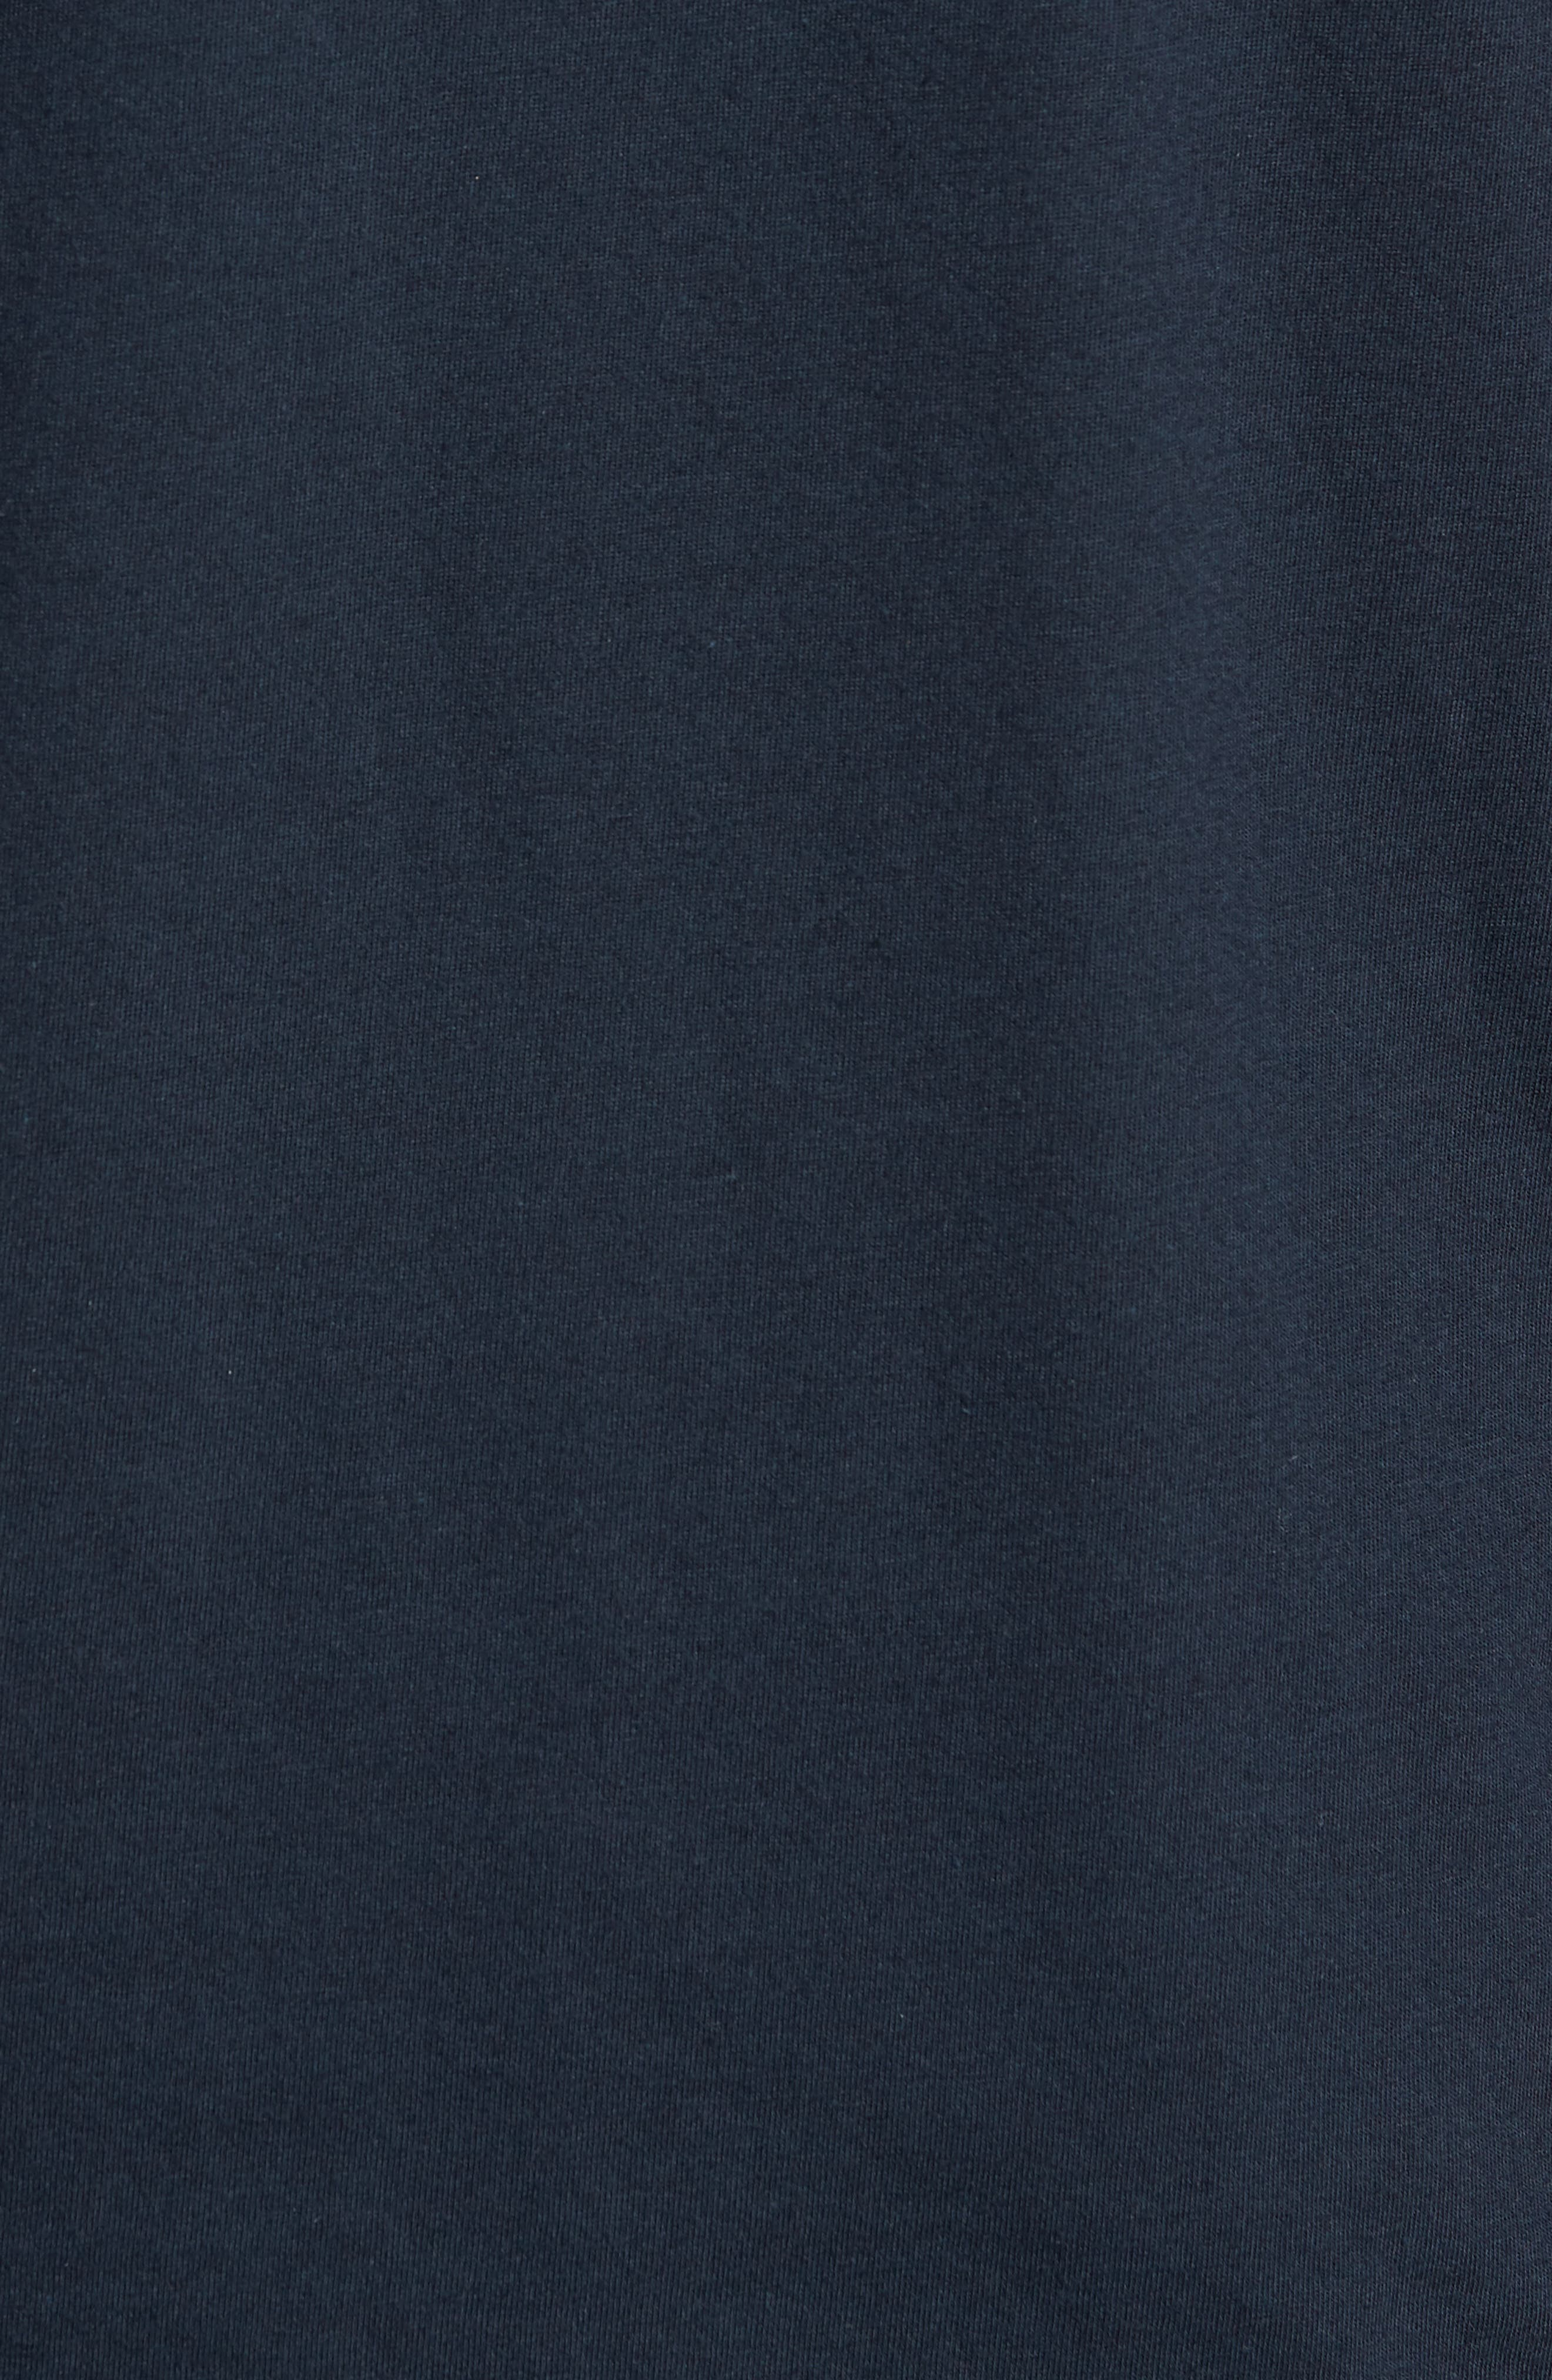 Nirvana Camo T-Shirt,                             Alternate thumbnail 5, color,                             Salute/ Navy